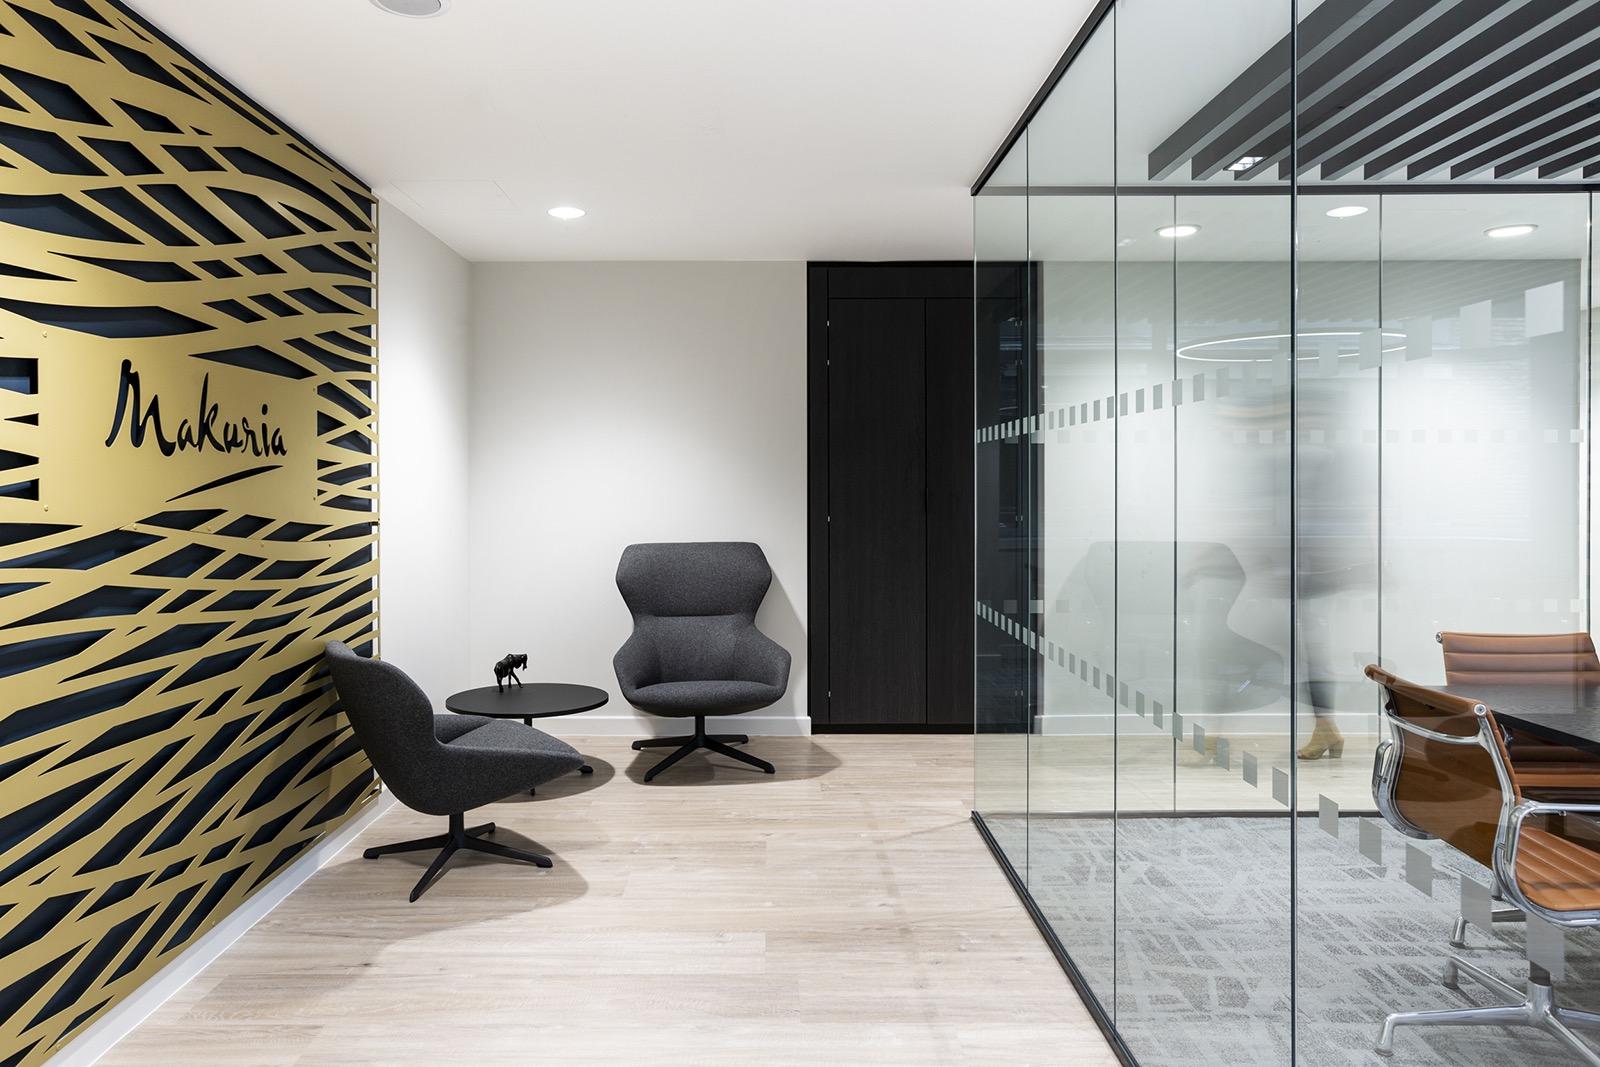 makuria-office-london-9